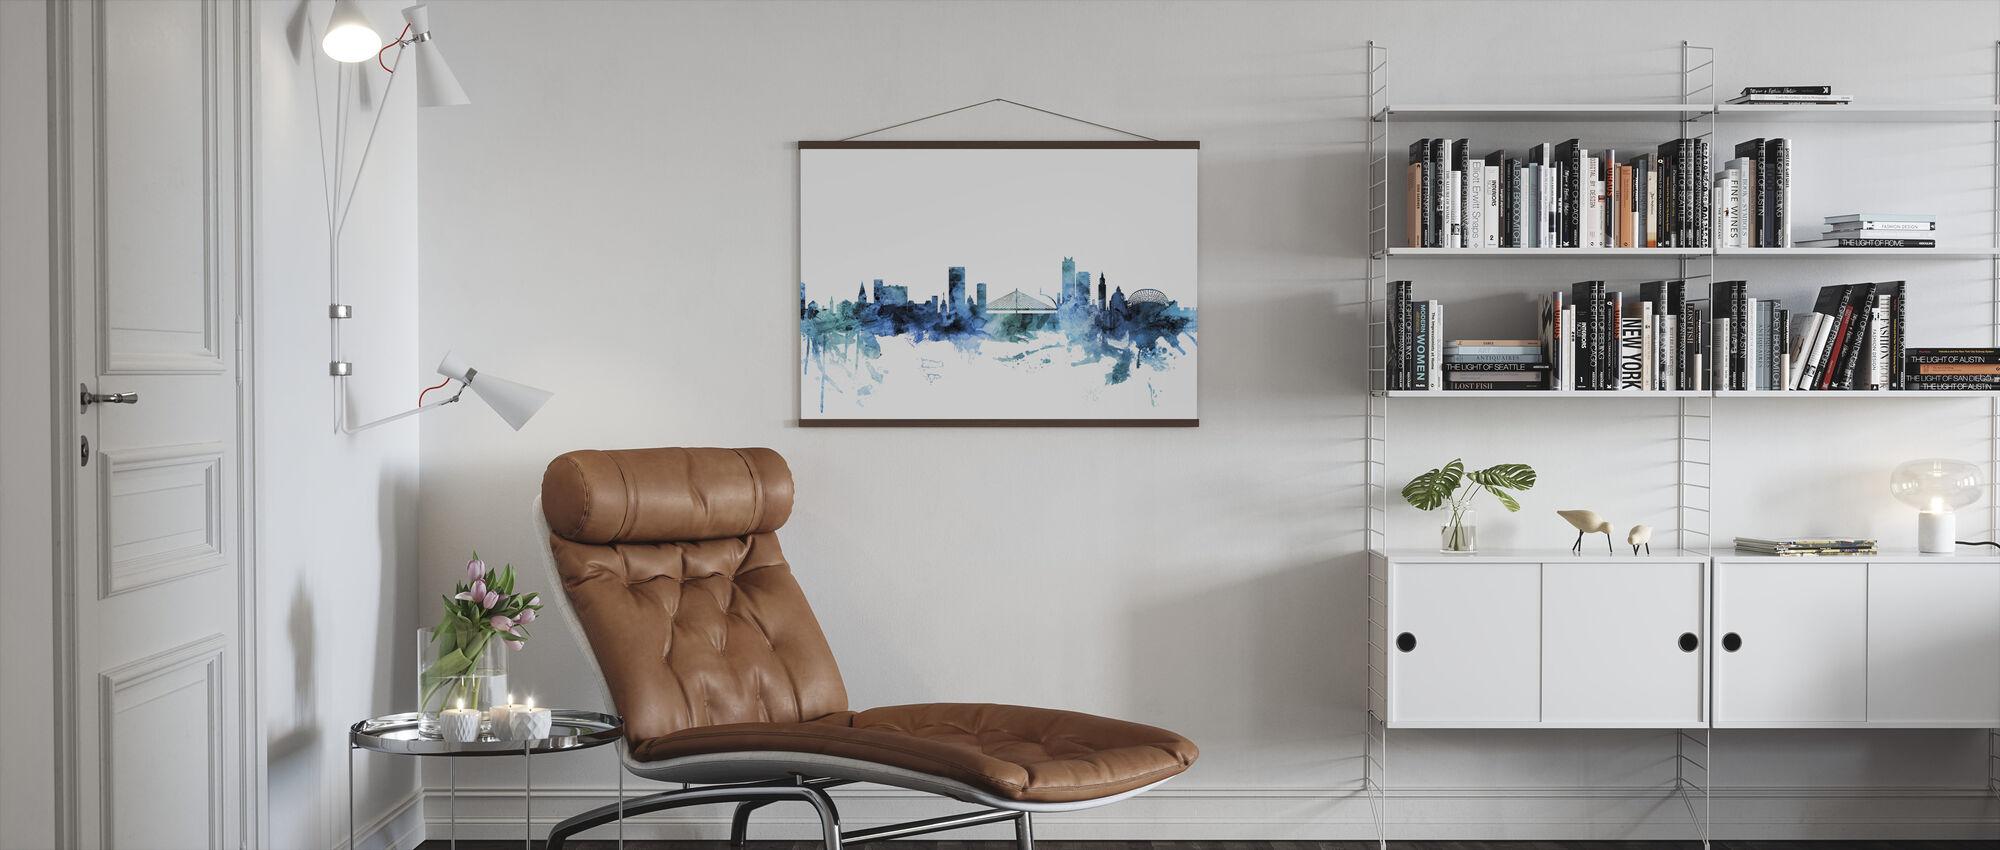 Liege Belgium Skyline - Poster - Living Room